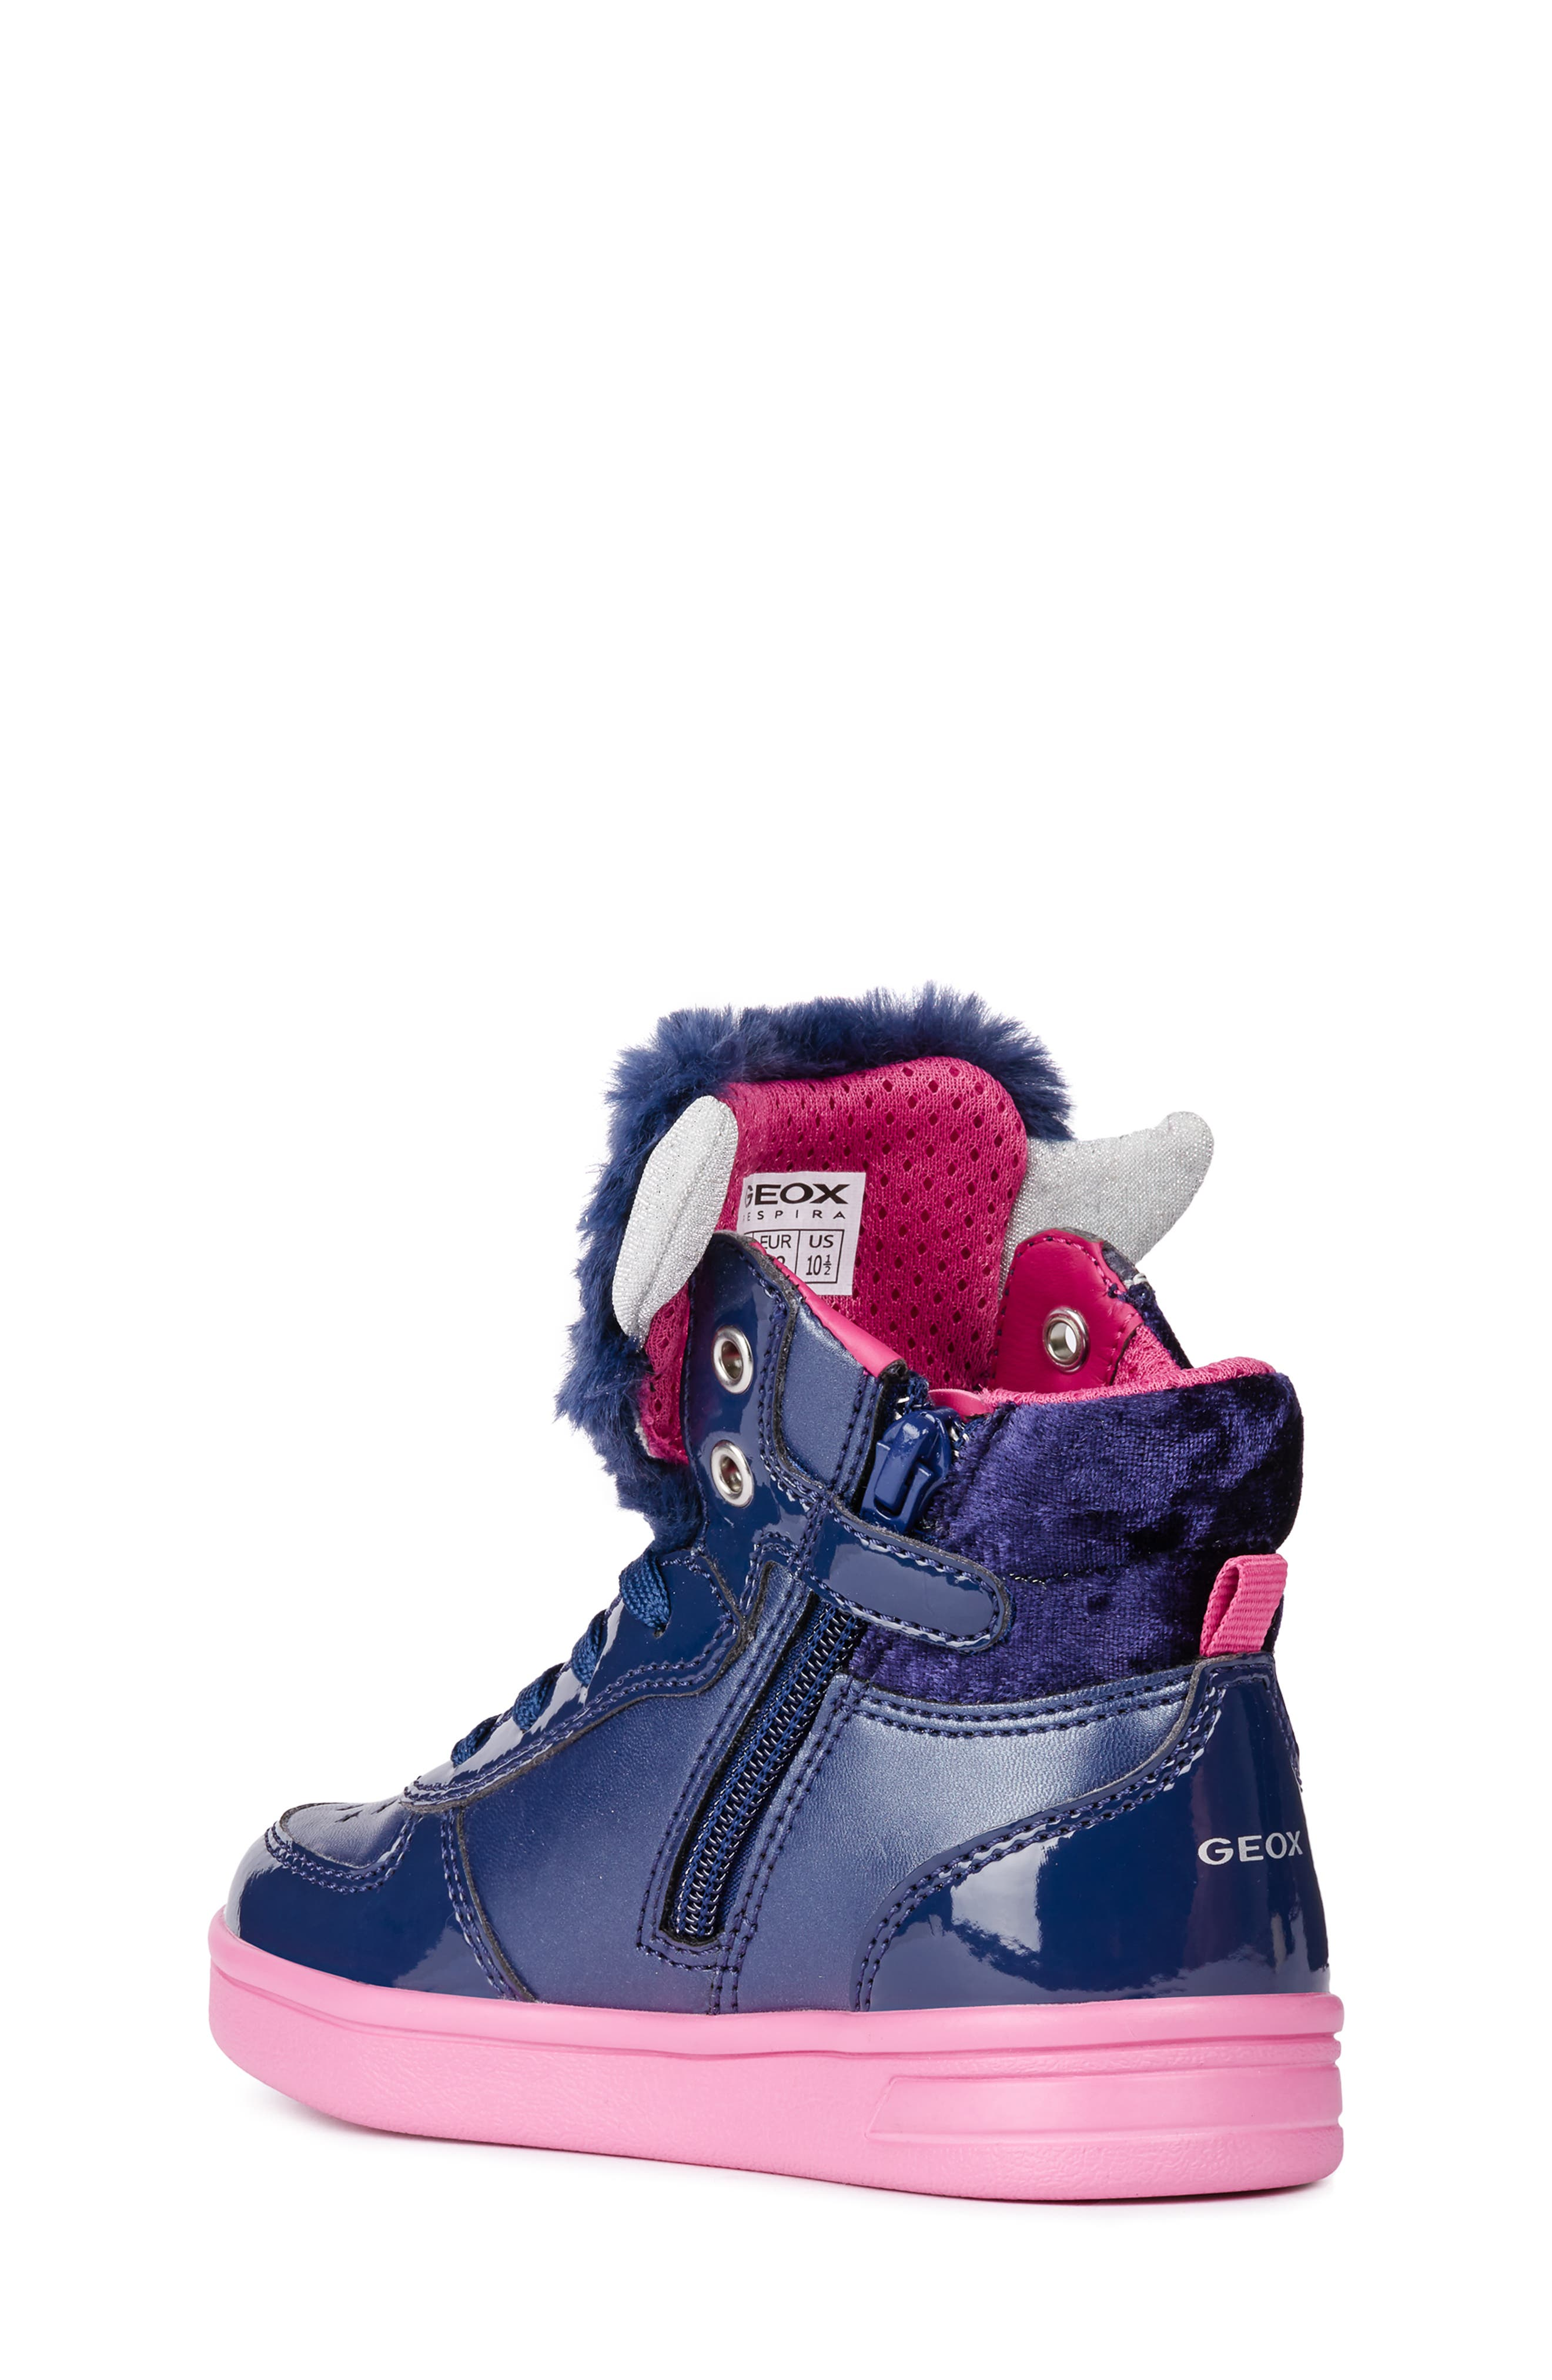 DJ Rock Fuzzy Friend Sneaker,                             Alternate thumbnail 2, color,                             NAVY/FUCHSIA